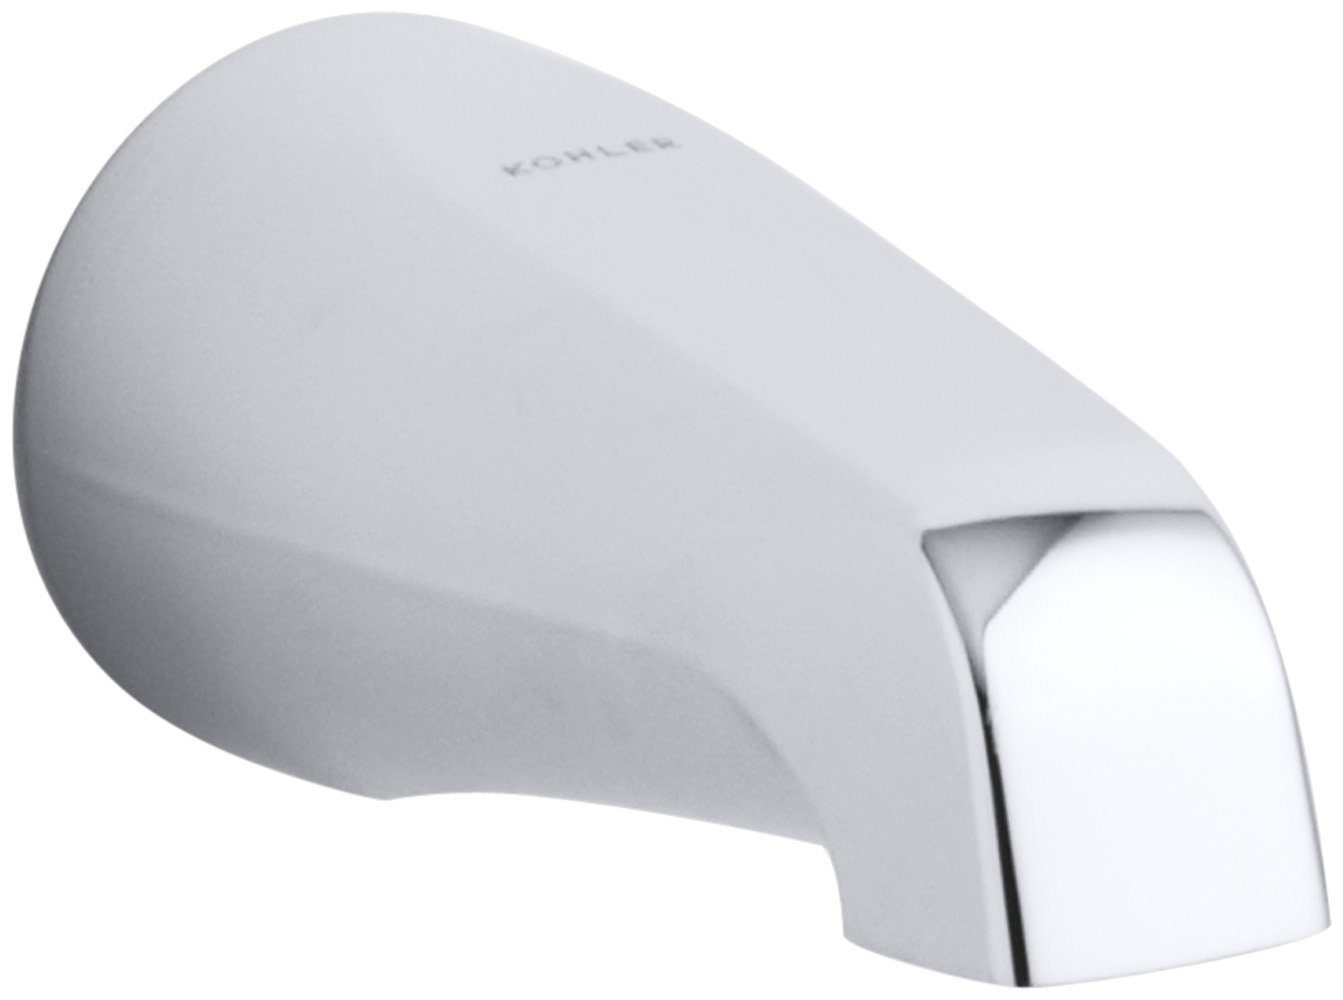 KOHLER K-15135-CP Coralais Non-Diverter Bath Spout, Polished Chrome ...